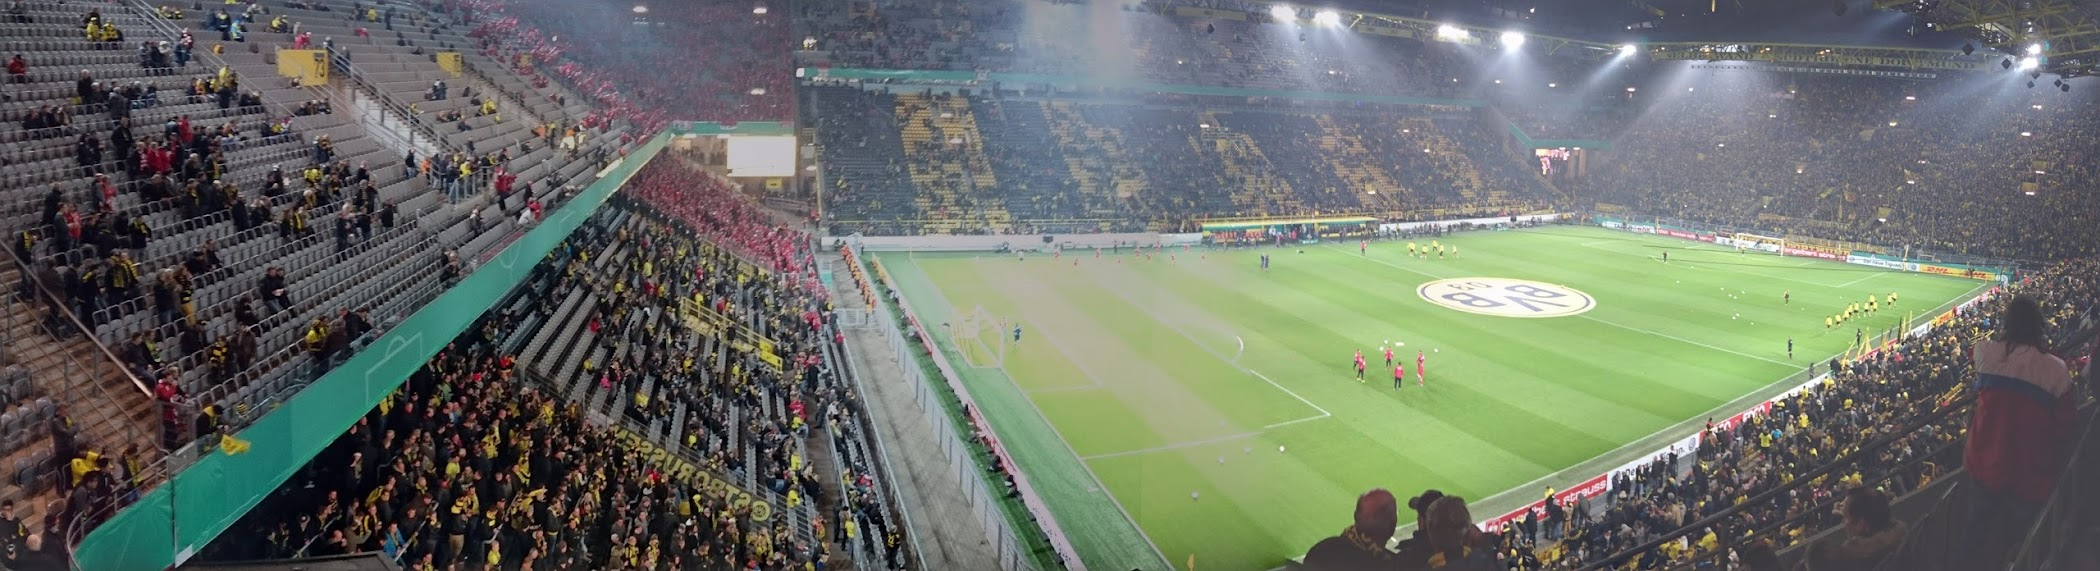 Borussia Dortmund Union Berlin Block 65 Signal Iduna Park BVB Panorama